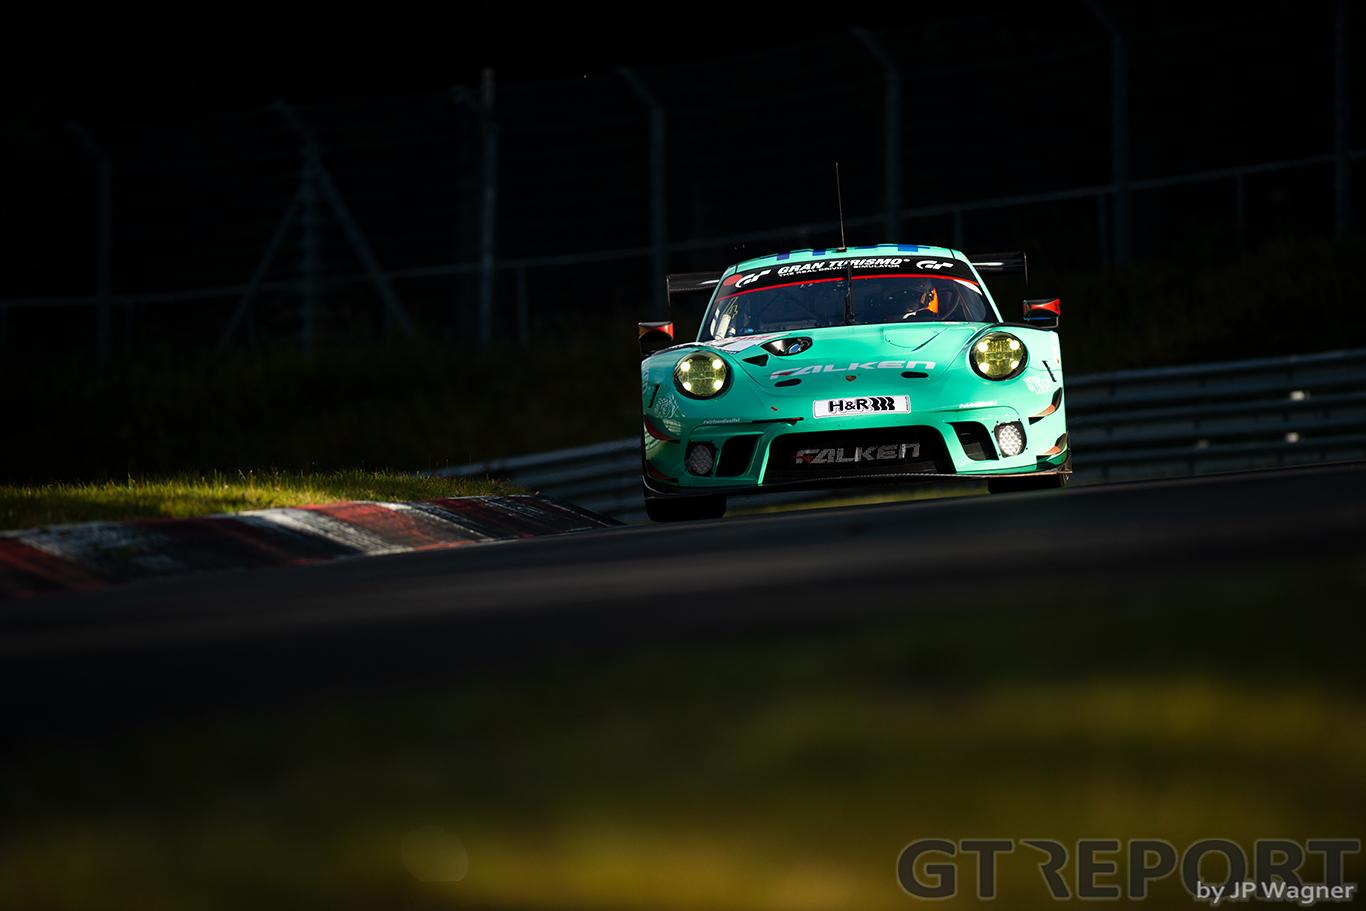 NLS7 qualifying report: Falken sweeps front row